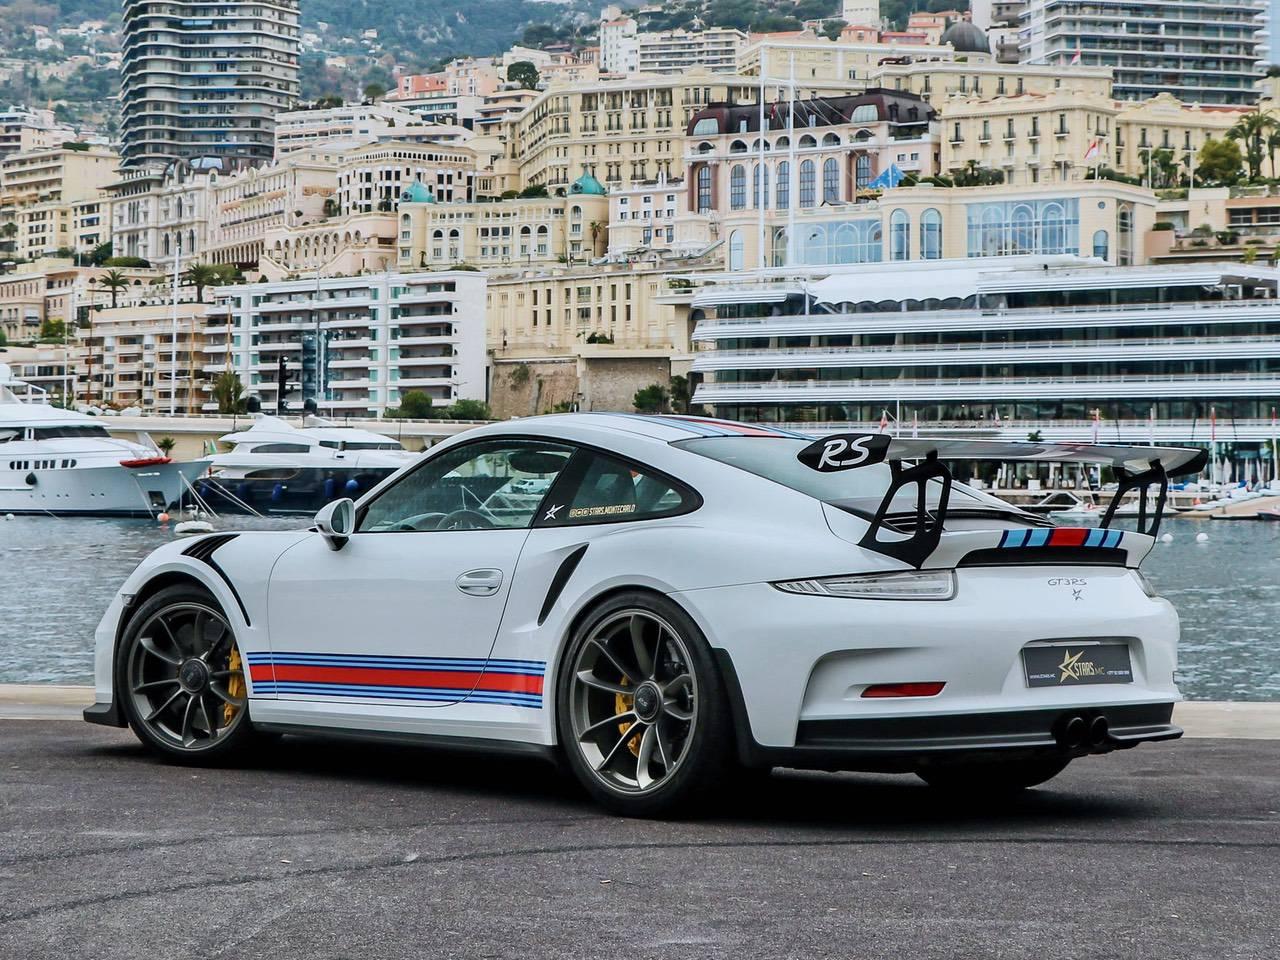 Porsche-991-Coupè-991-PDK-GT3-RS-Martini-10